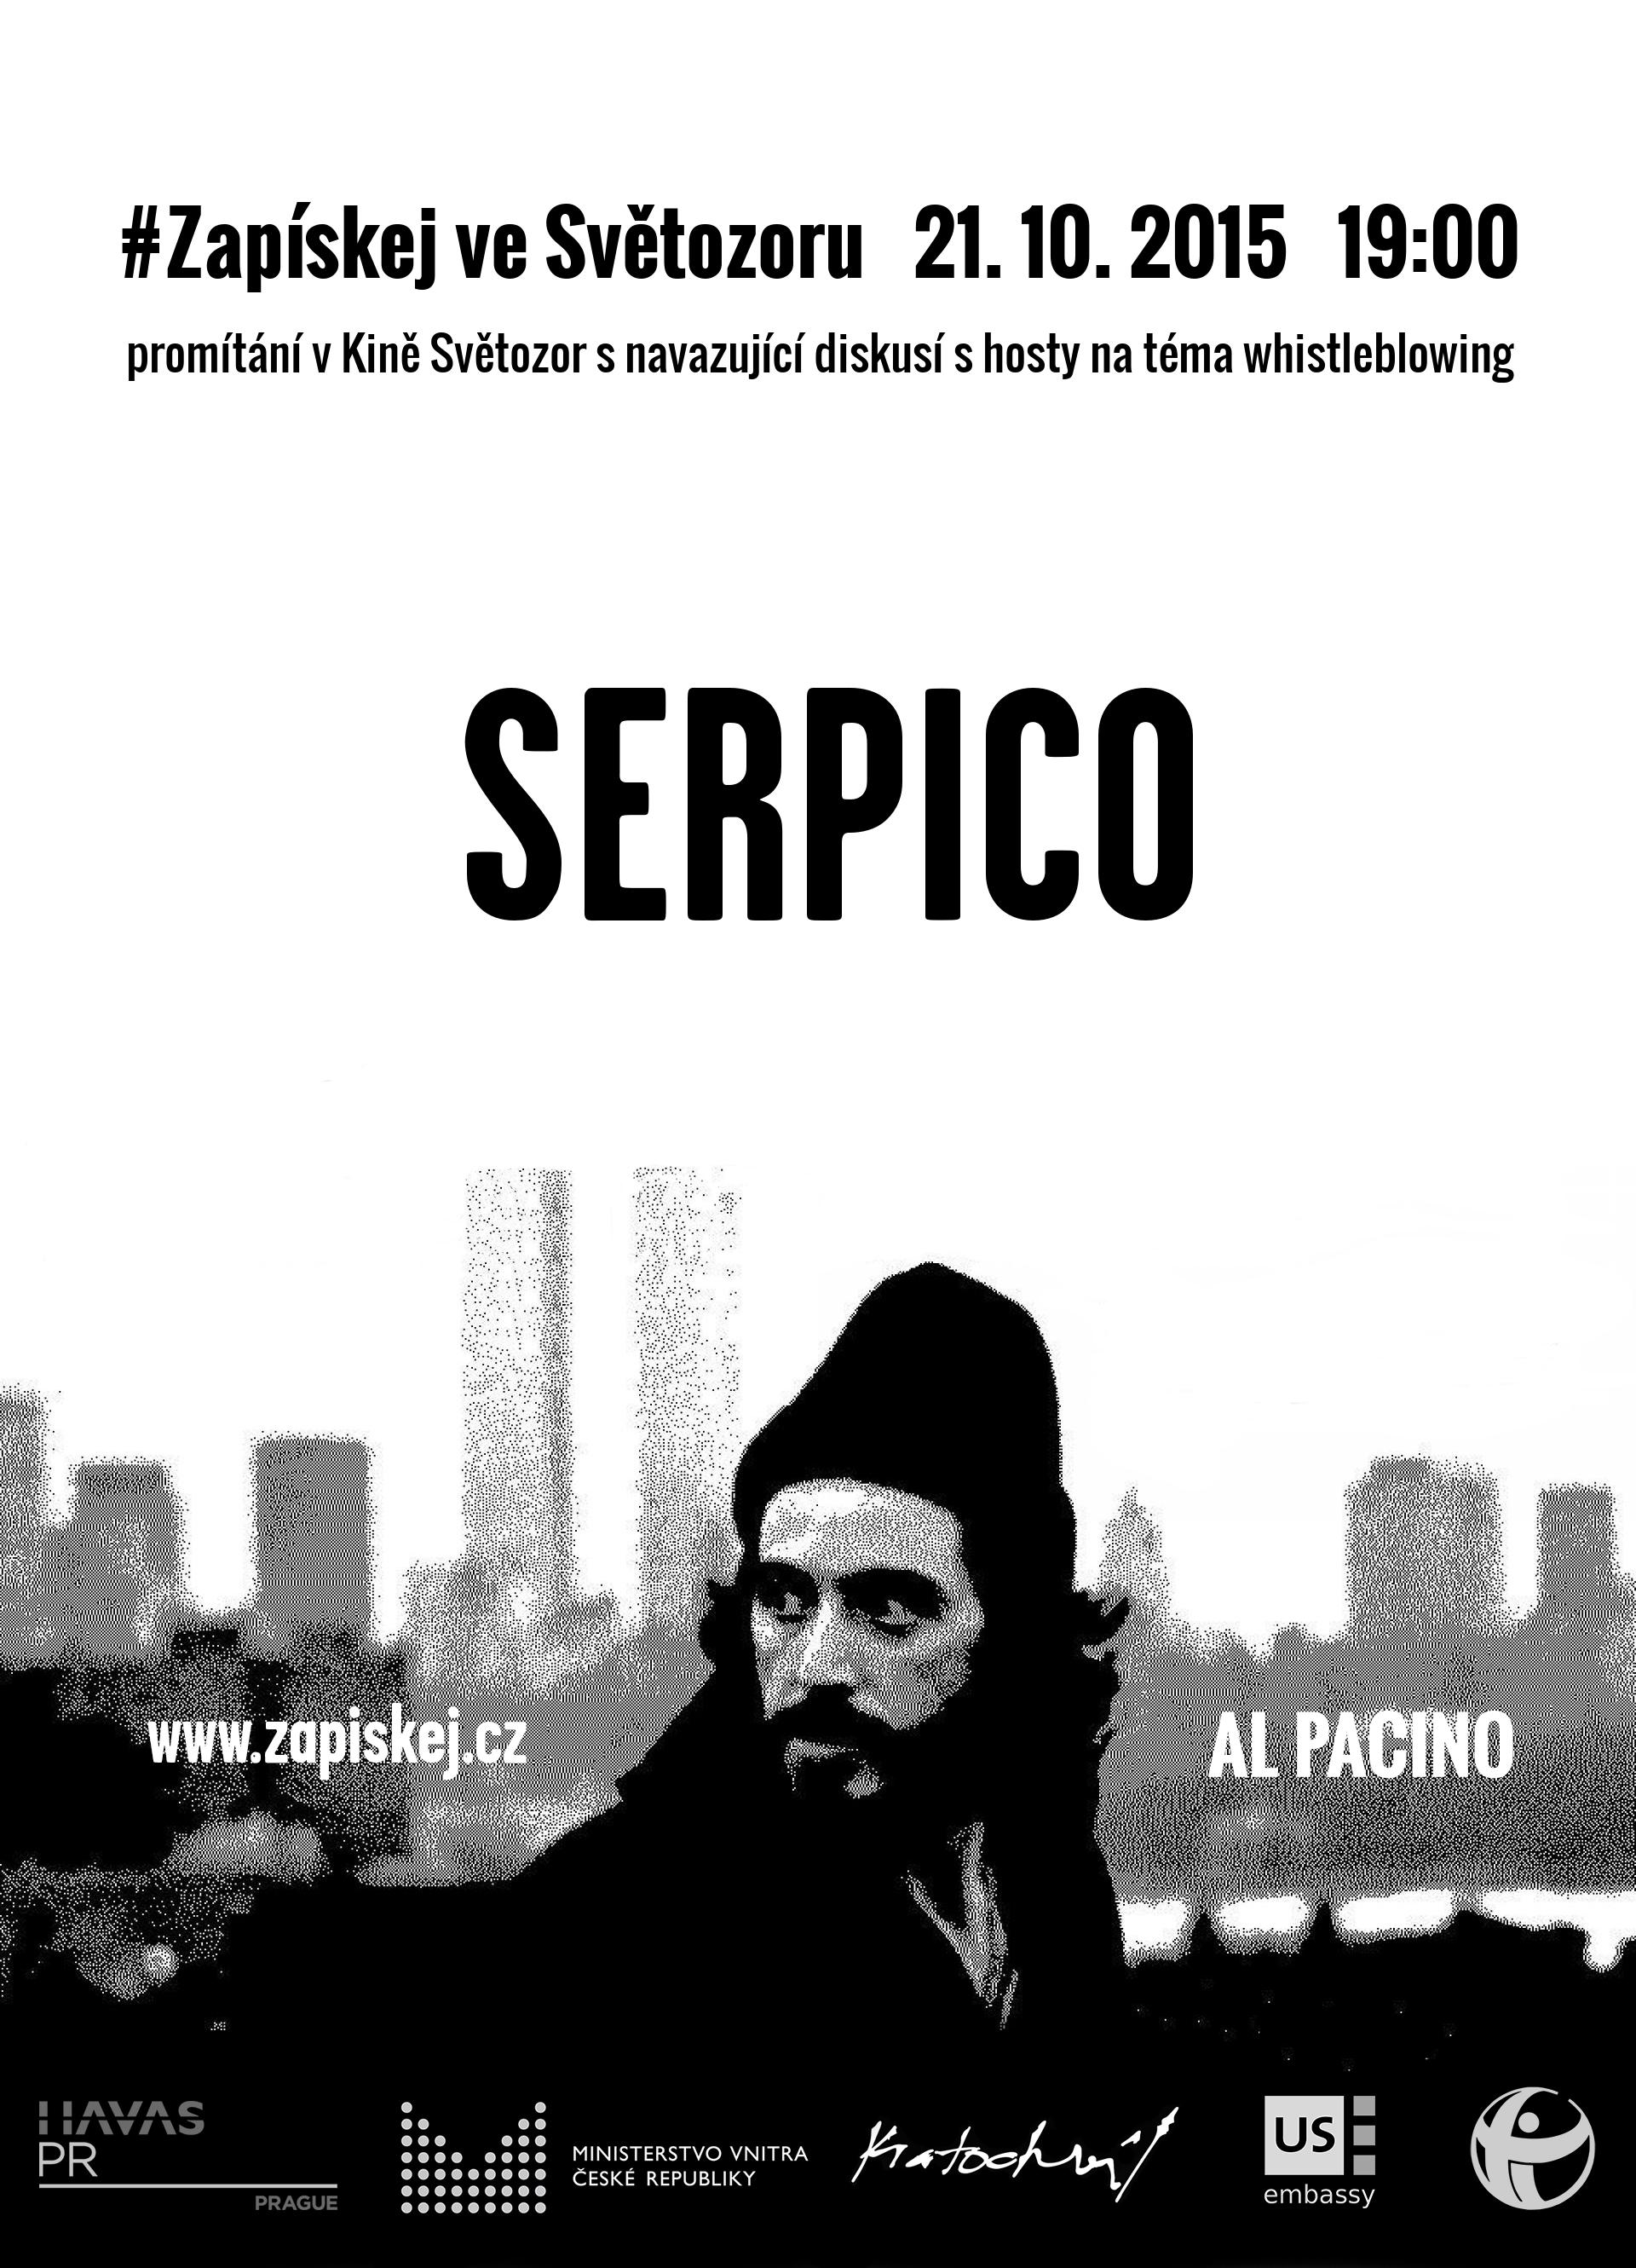 SERPICO Poster - final 2015